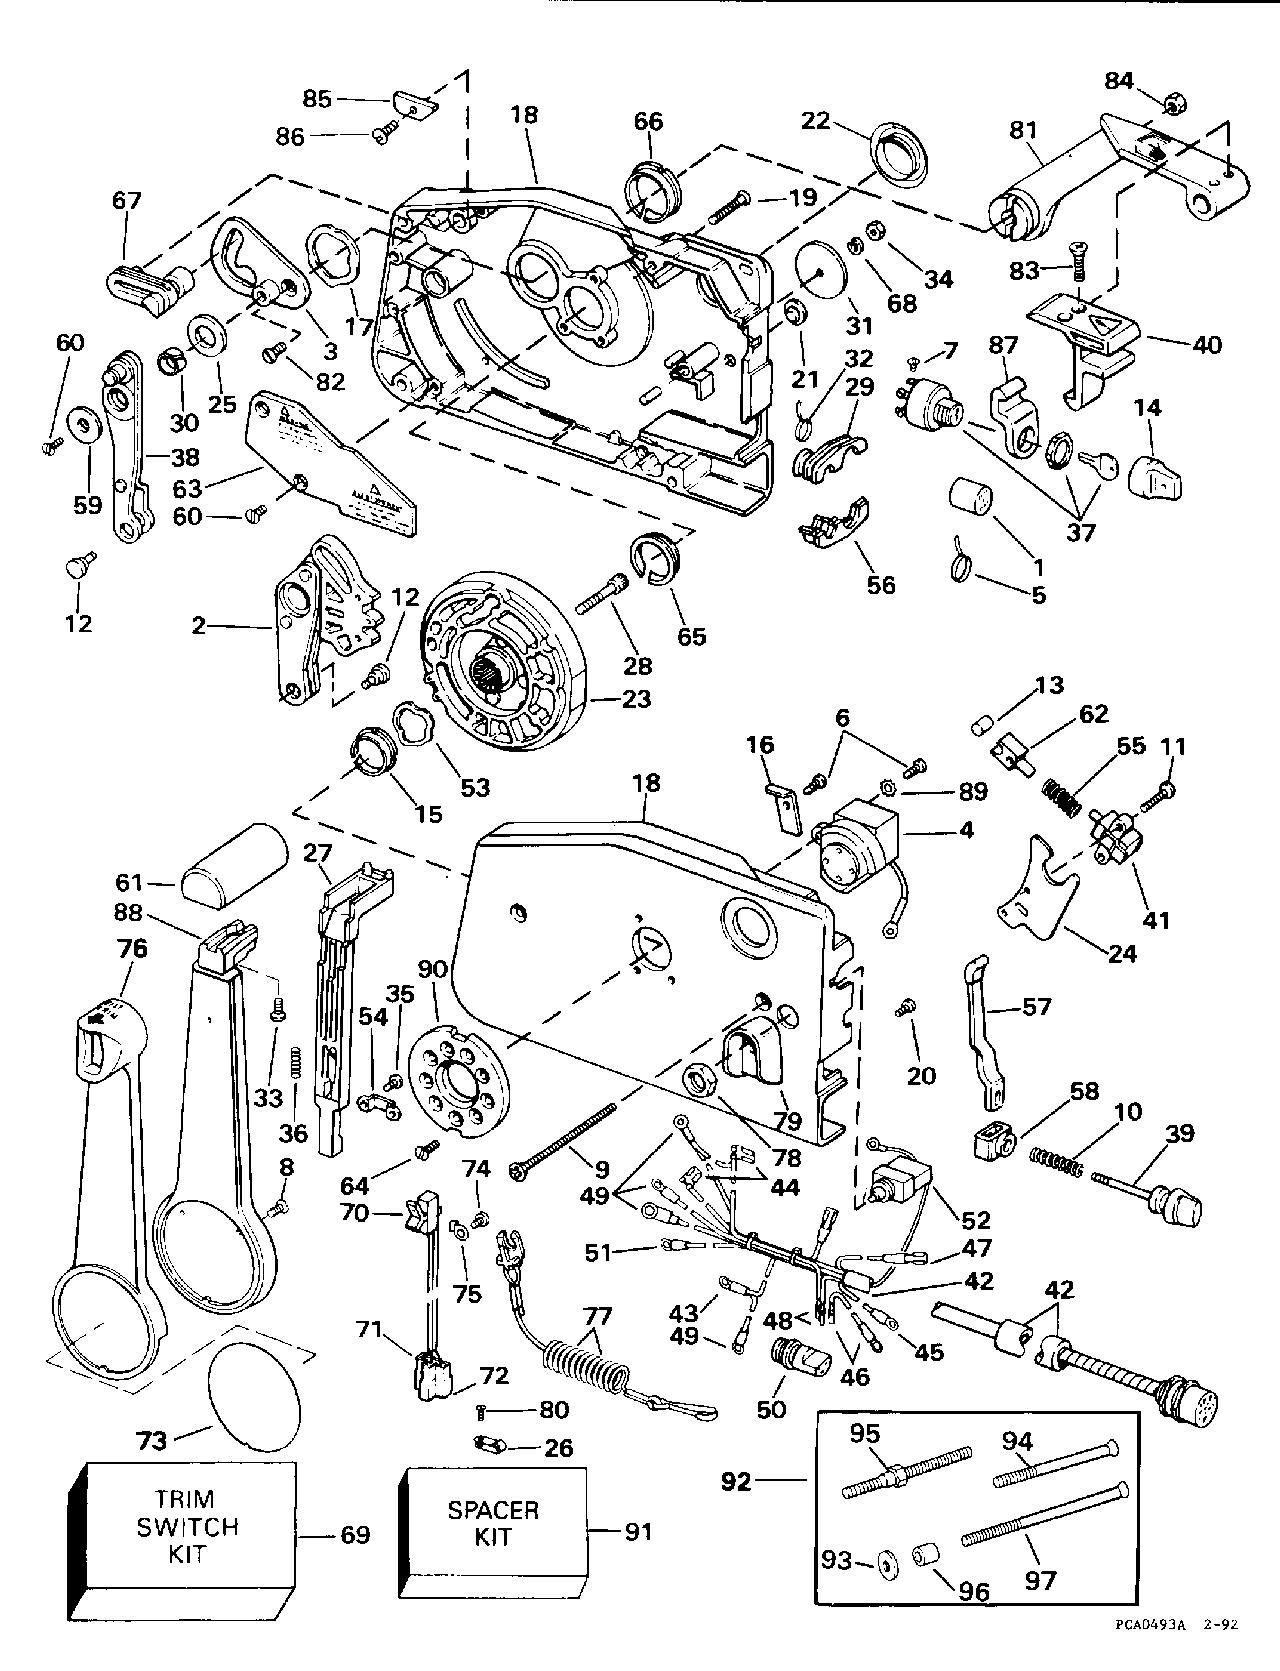 Johnson Control Box Diagram Gallery